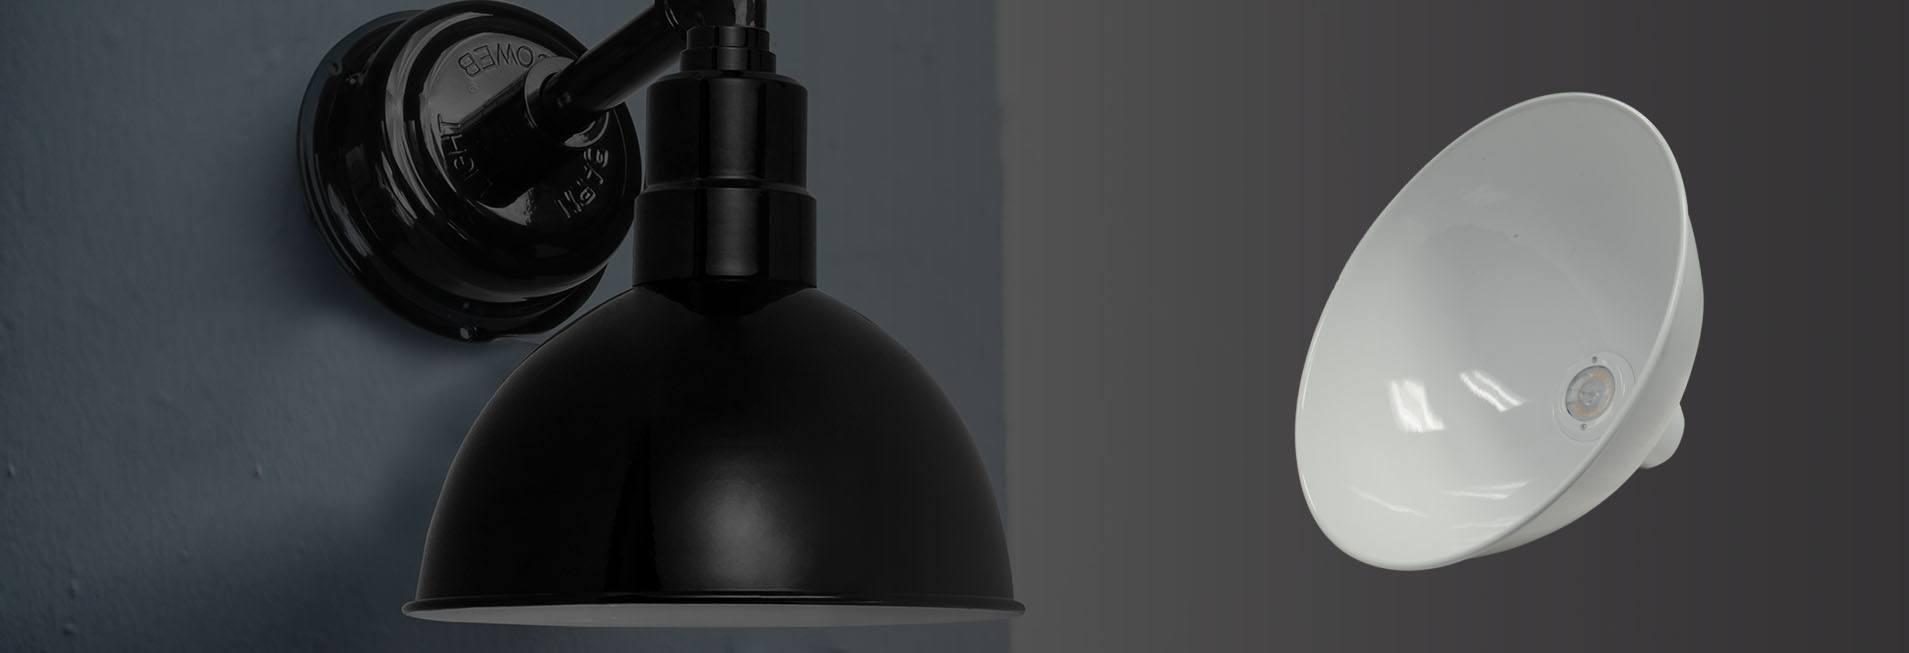 Blackspot LED Wall Sconce weatherproof